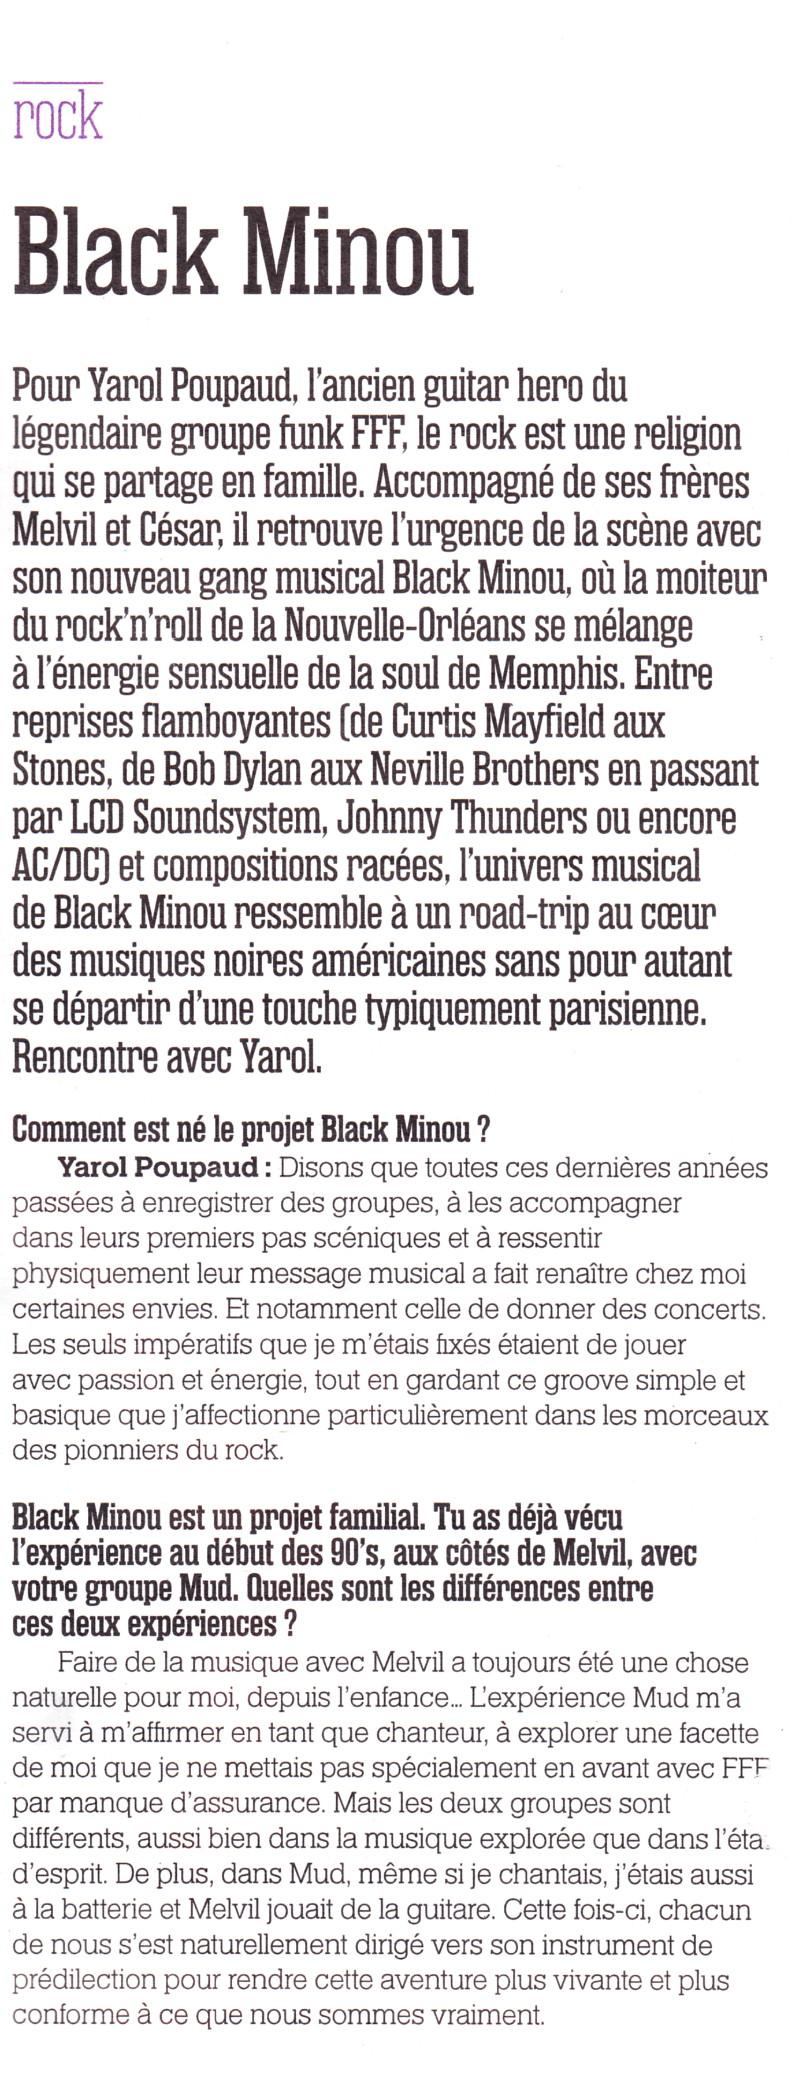 Yarol Poupaud, Black Minou & Johnny Hallyday par Philippe Manoeuvre (Rock&Folk) - Page 2 13051507245315789311192060